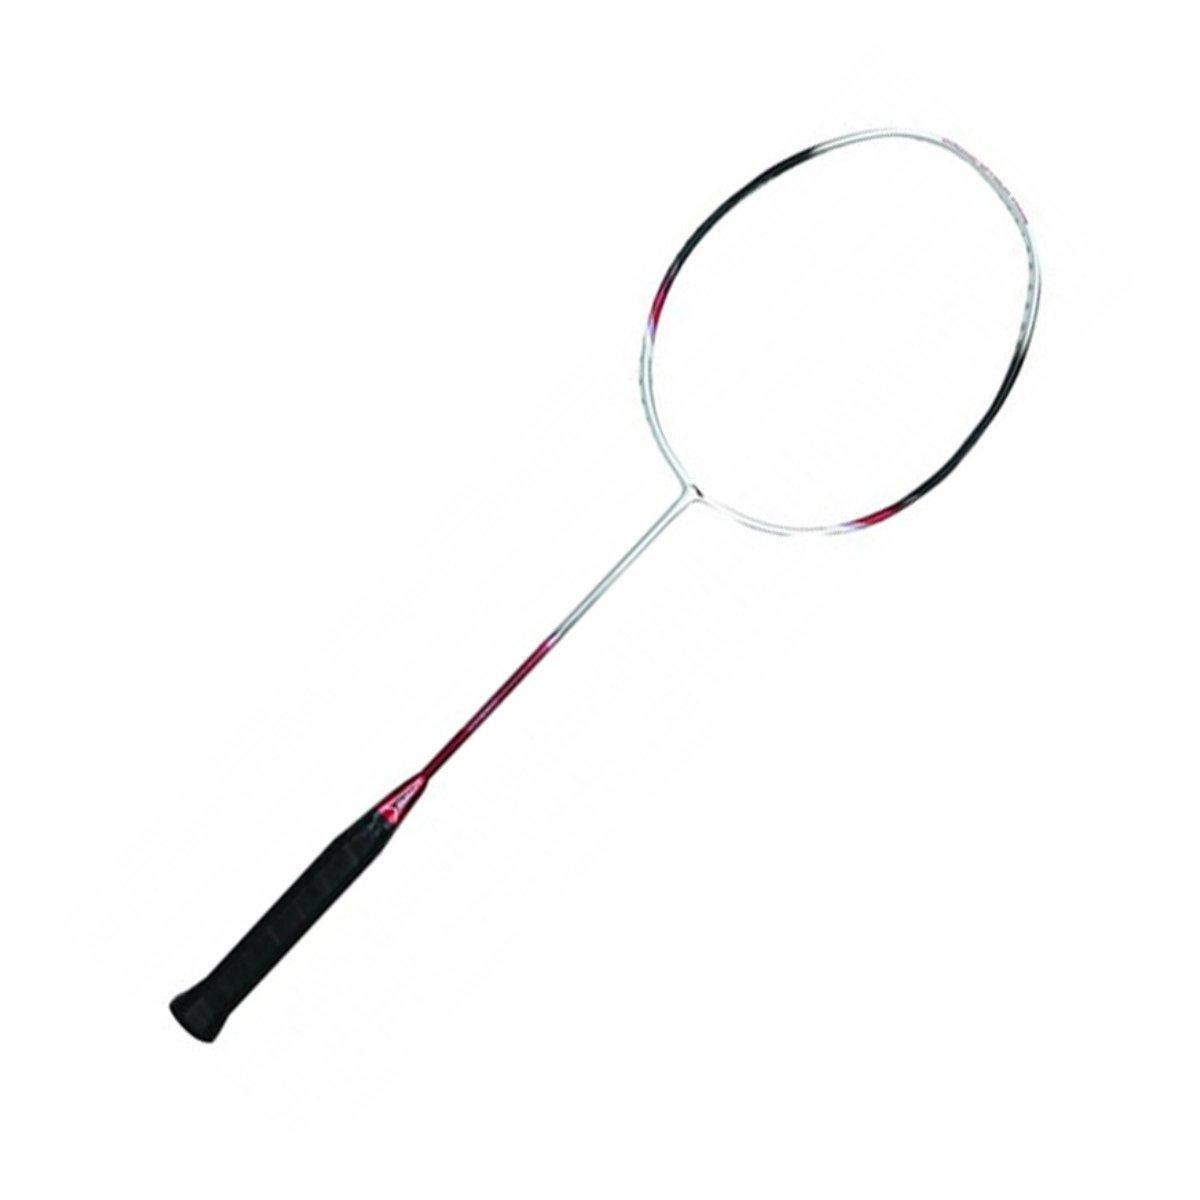 79c2a78a822 Victor Challenger Badminton Racquets At FLAT 70% OFF. at FreeKaaMaal.com